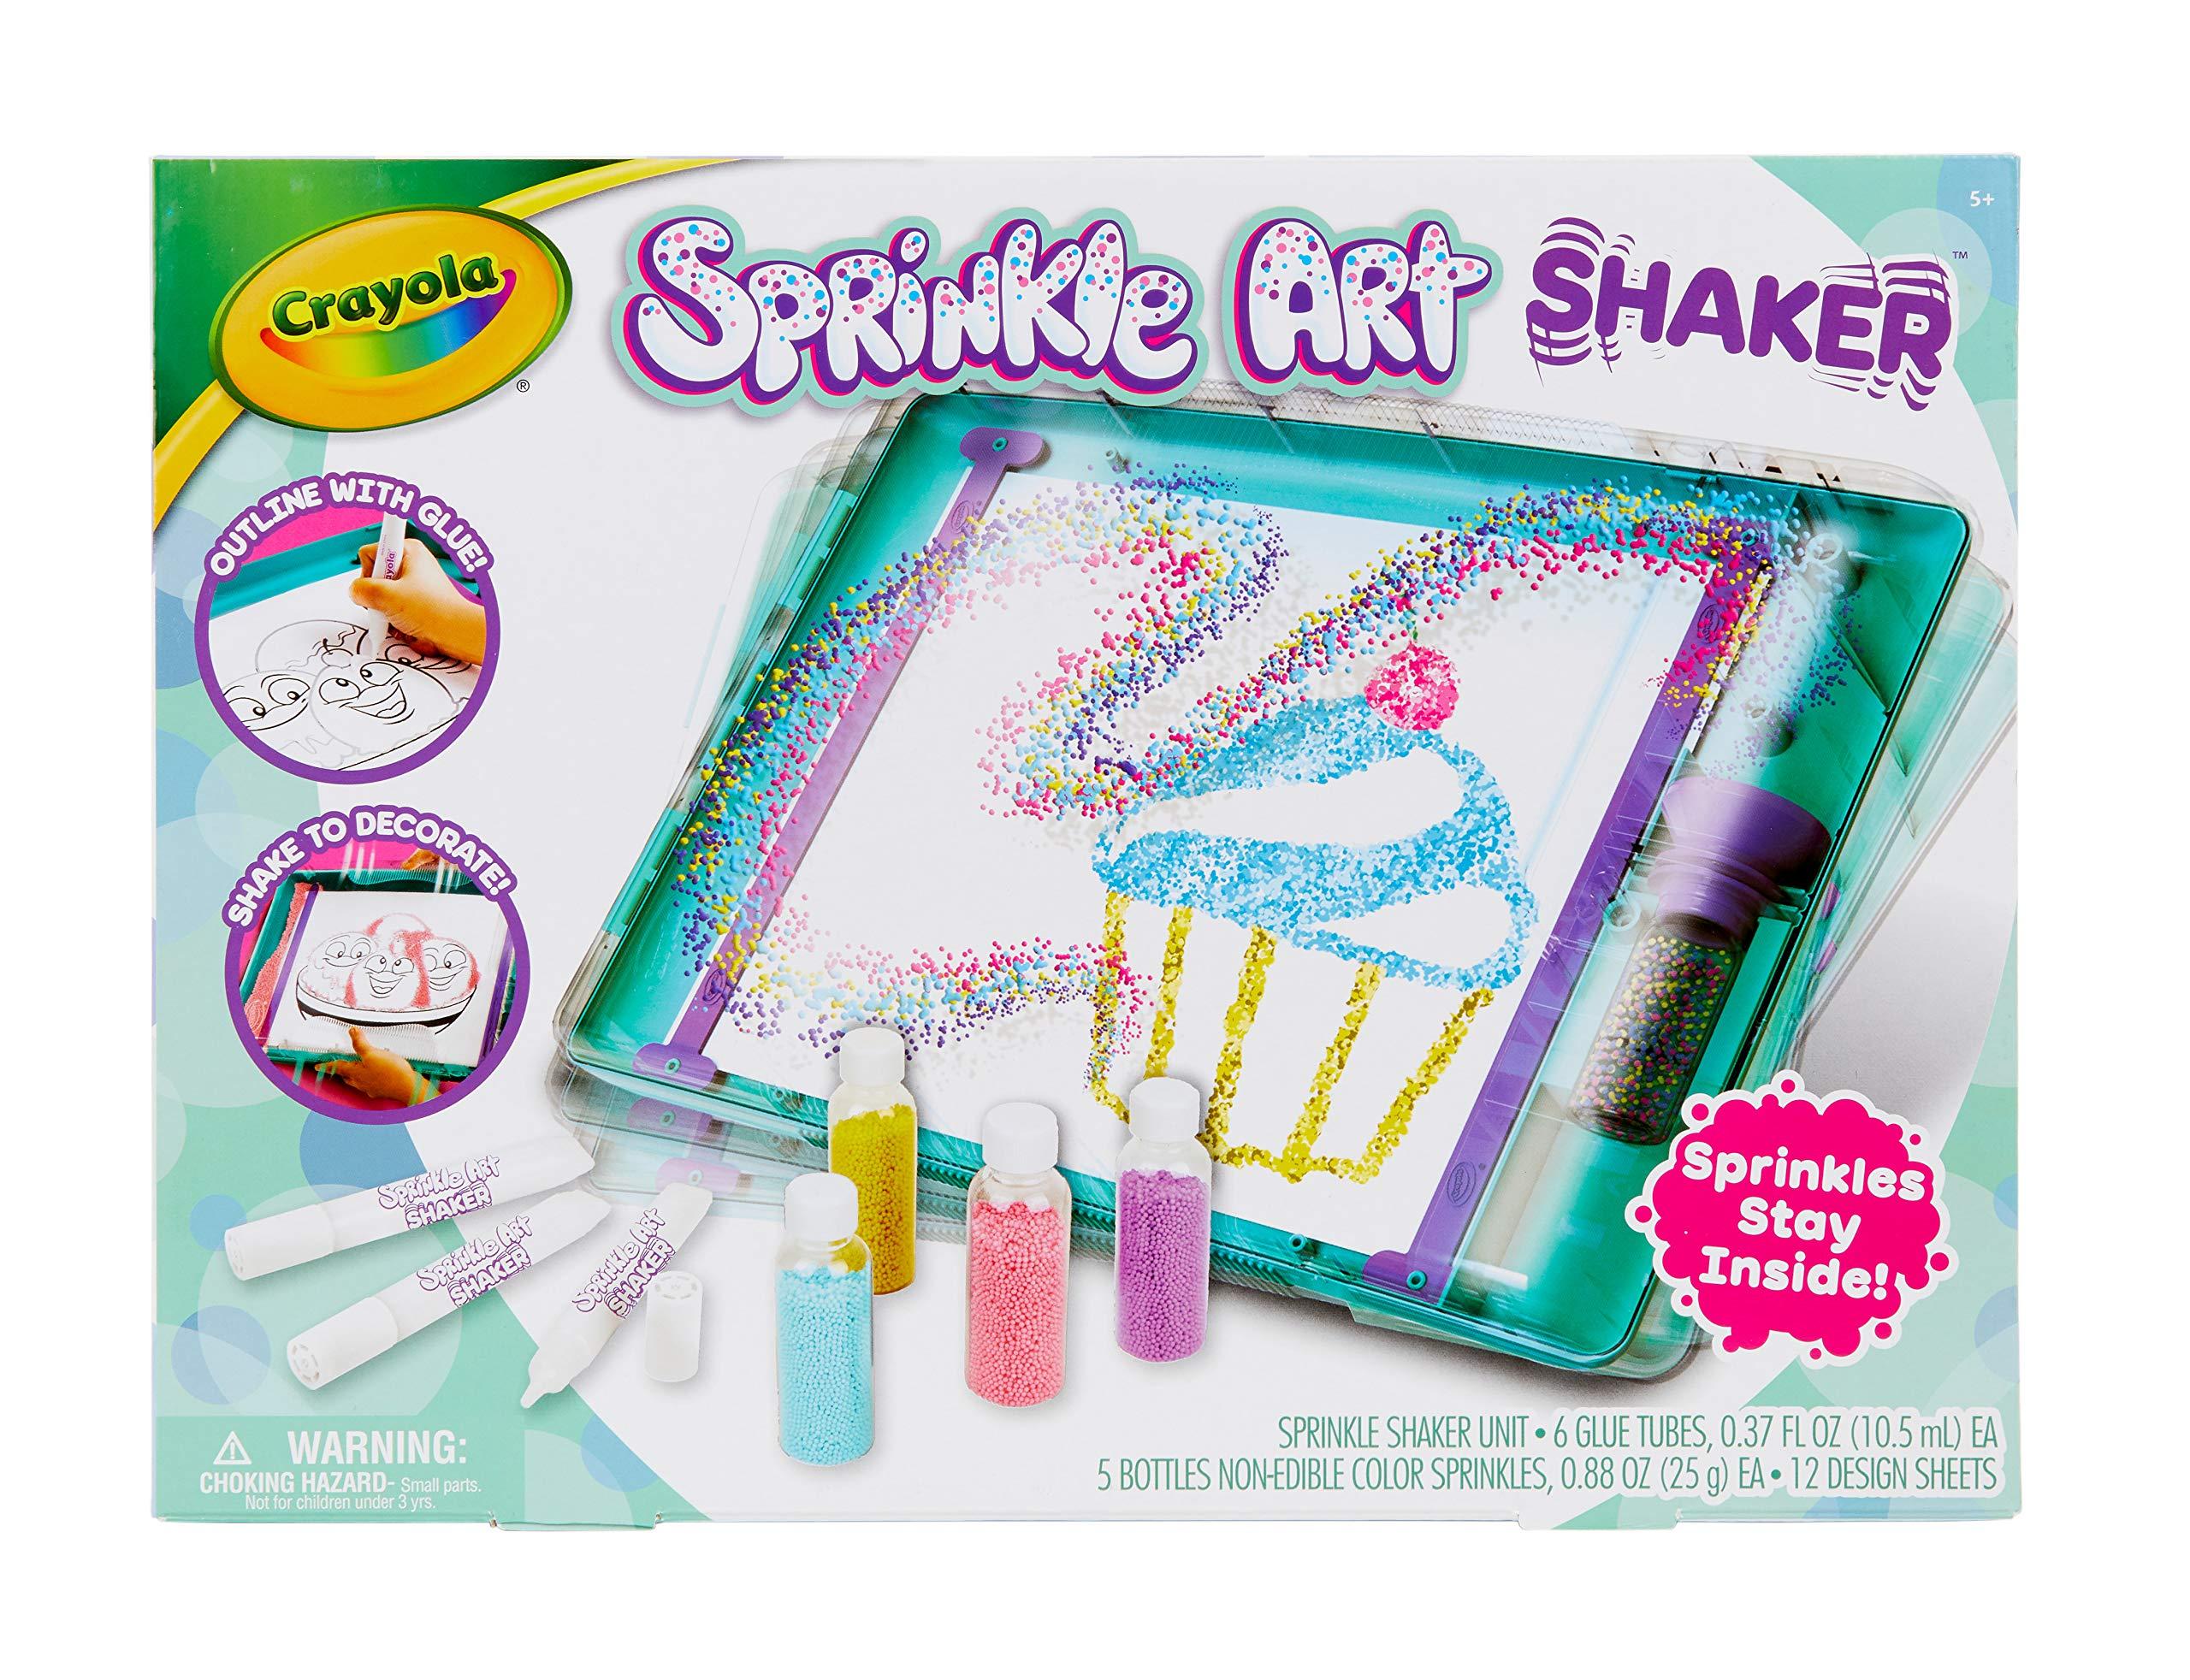 Crayola Sprinkle Art Shaker, Rainbow Arts & Crafts for Girls, Gift, Age 5, 6, 7, 8 by Crayola